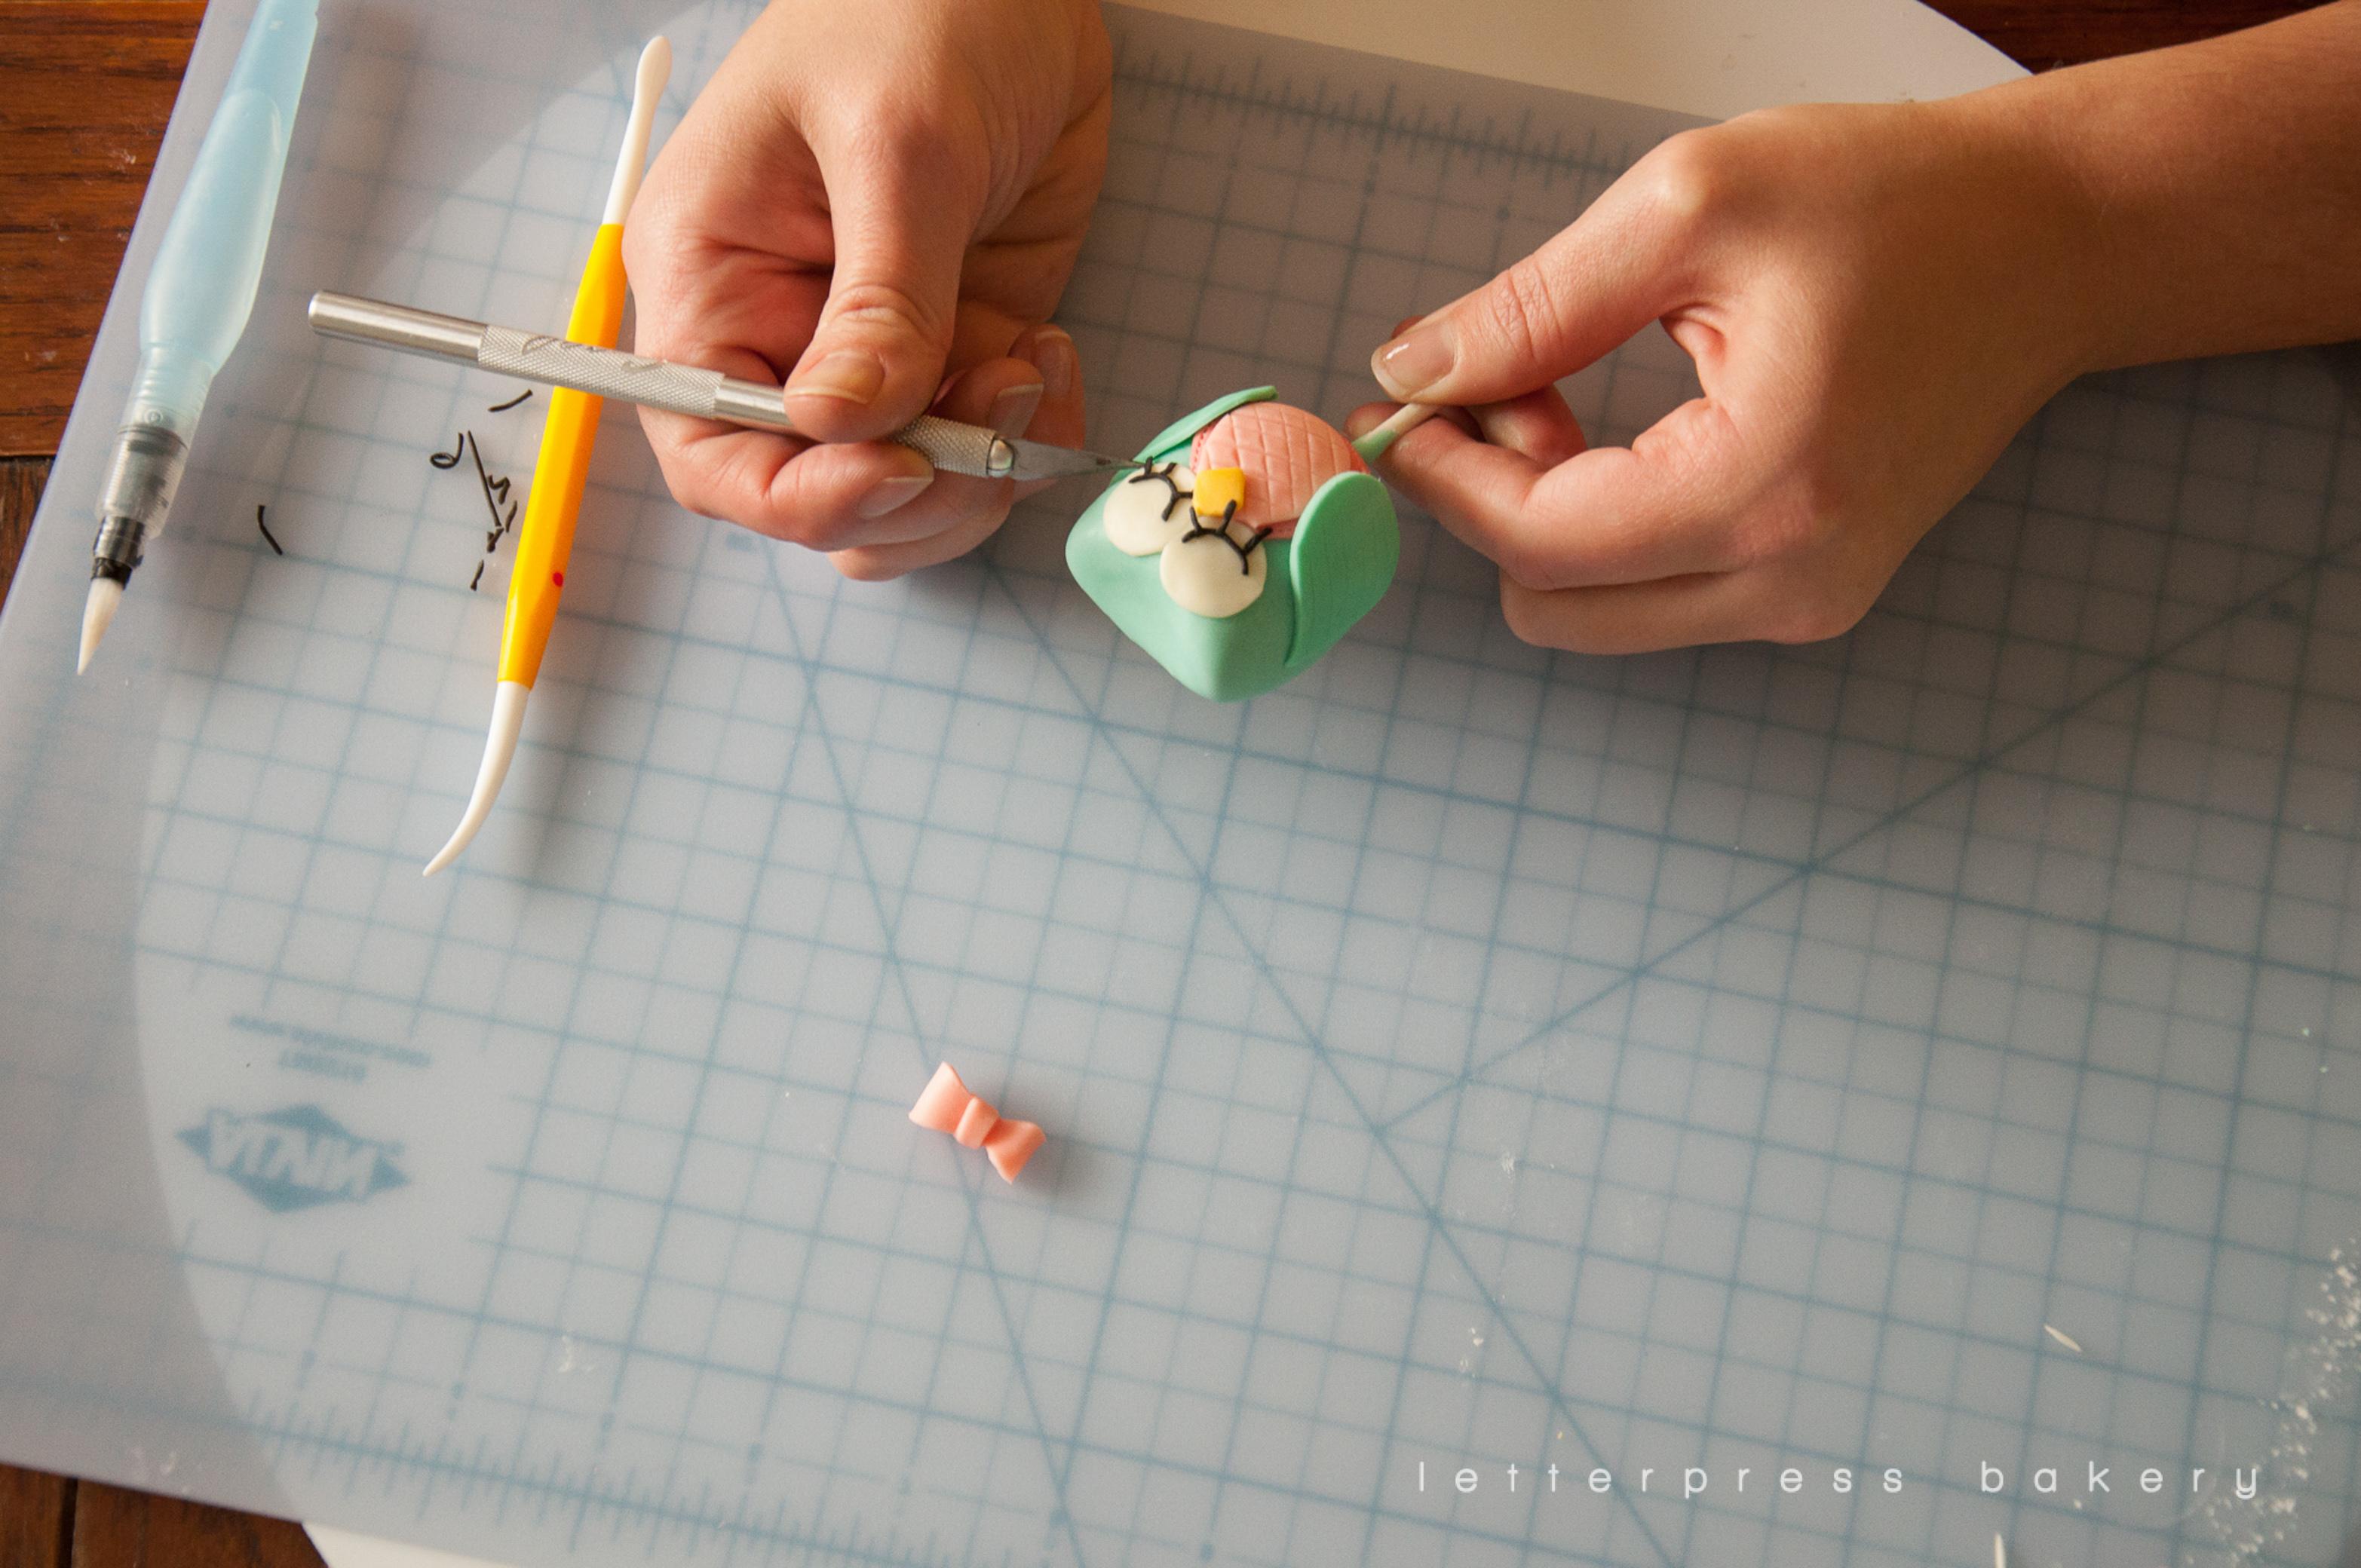 Adding eyelashes to make it a girl